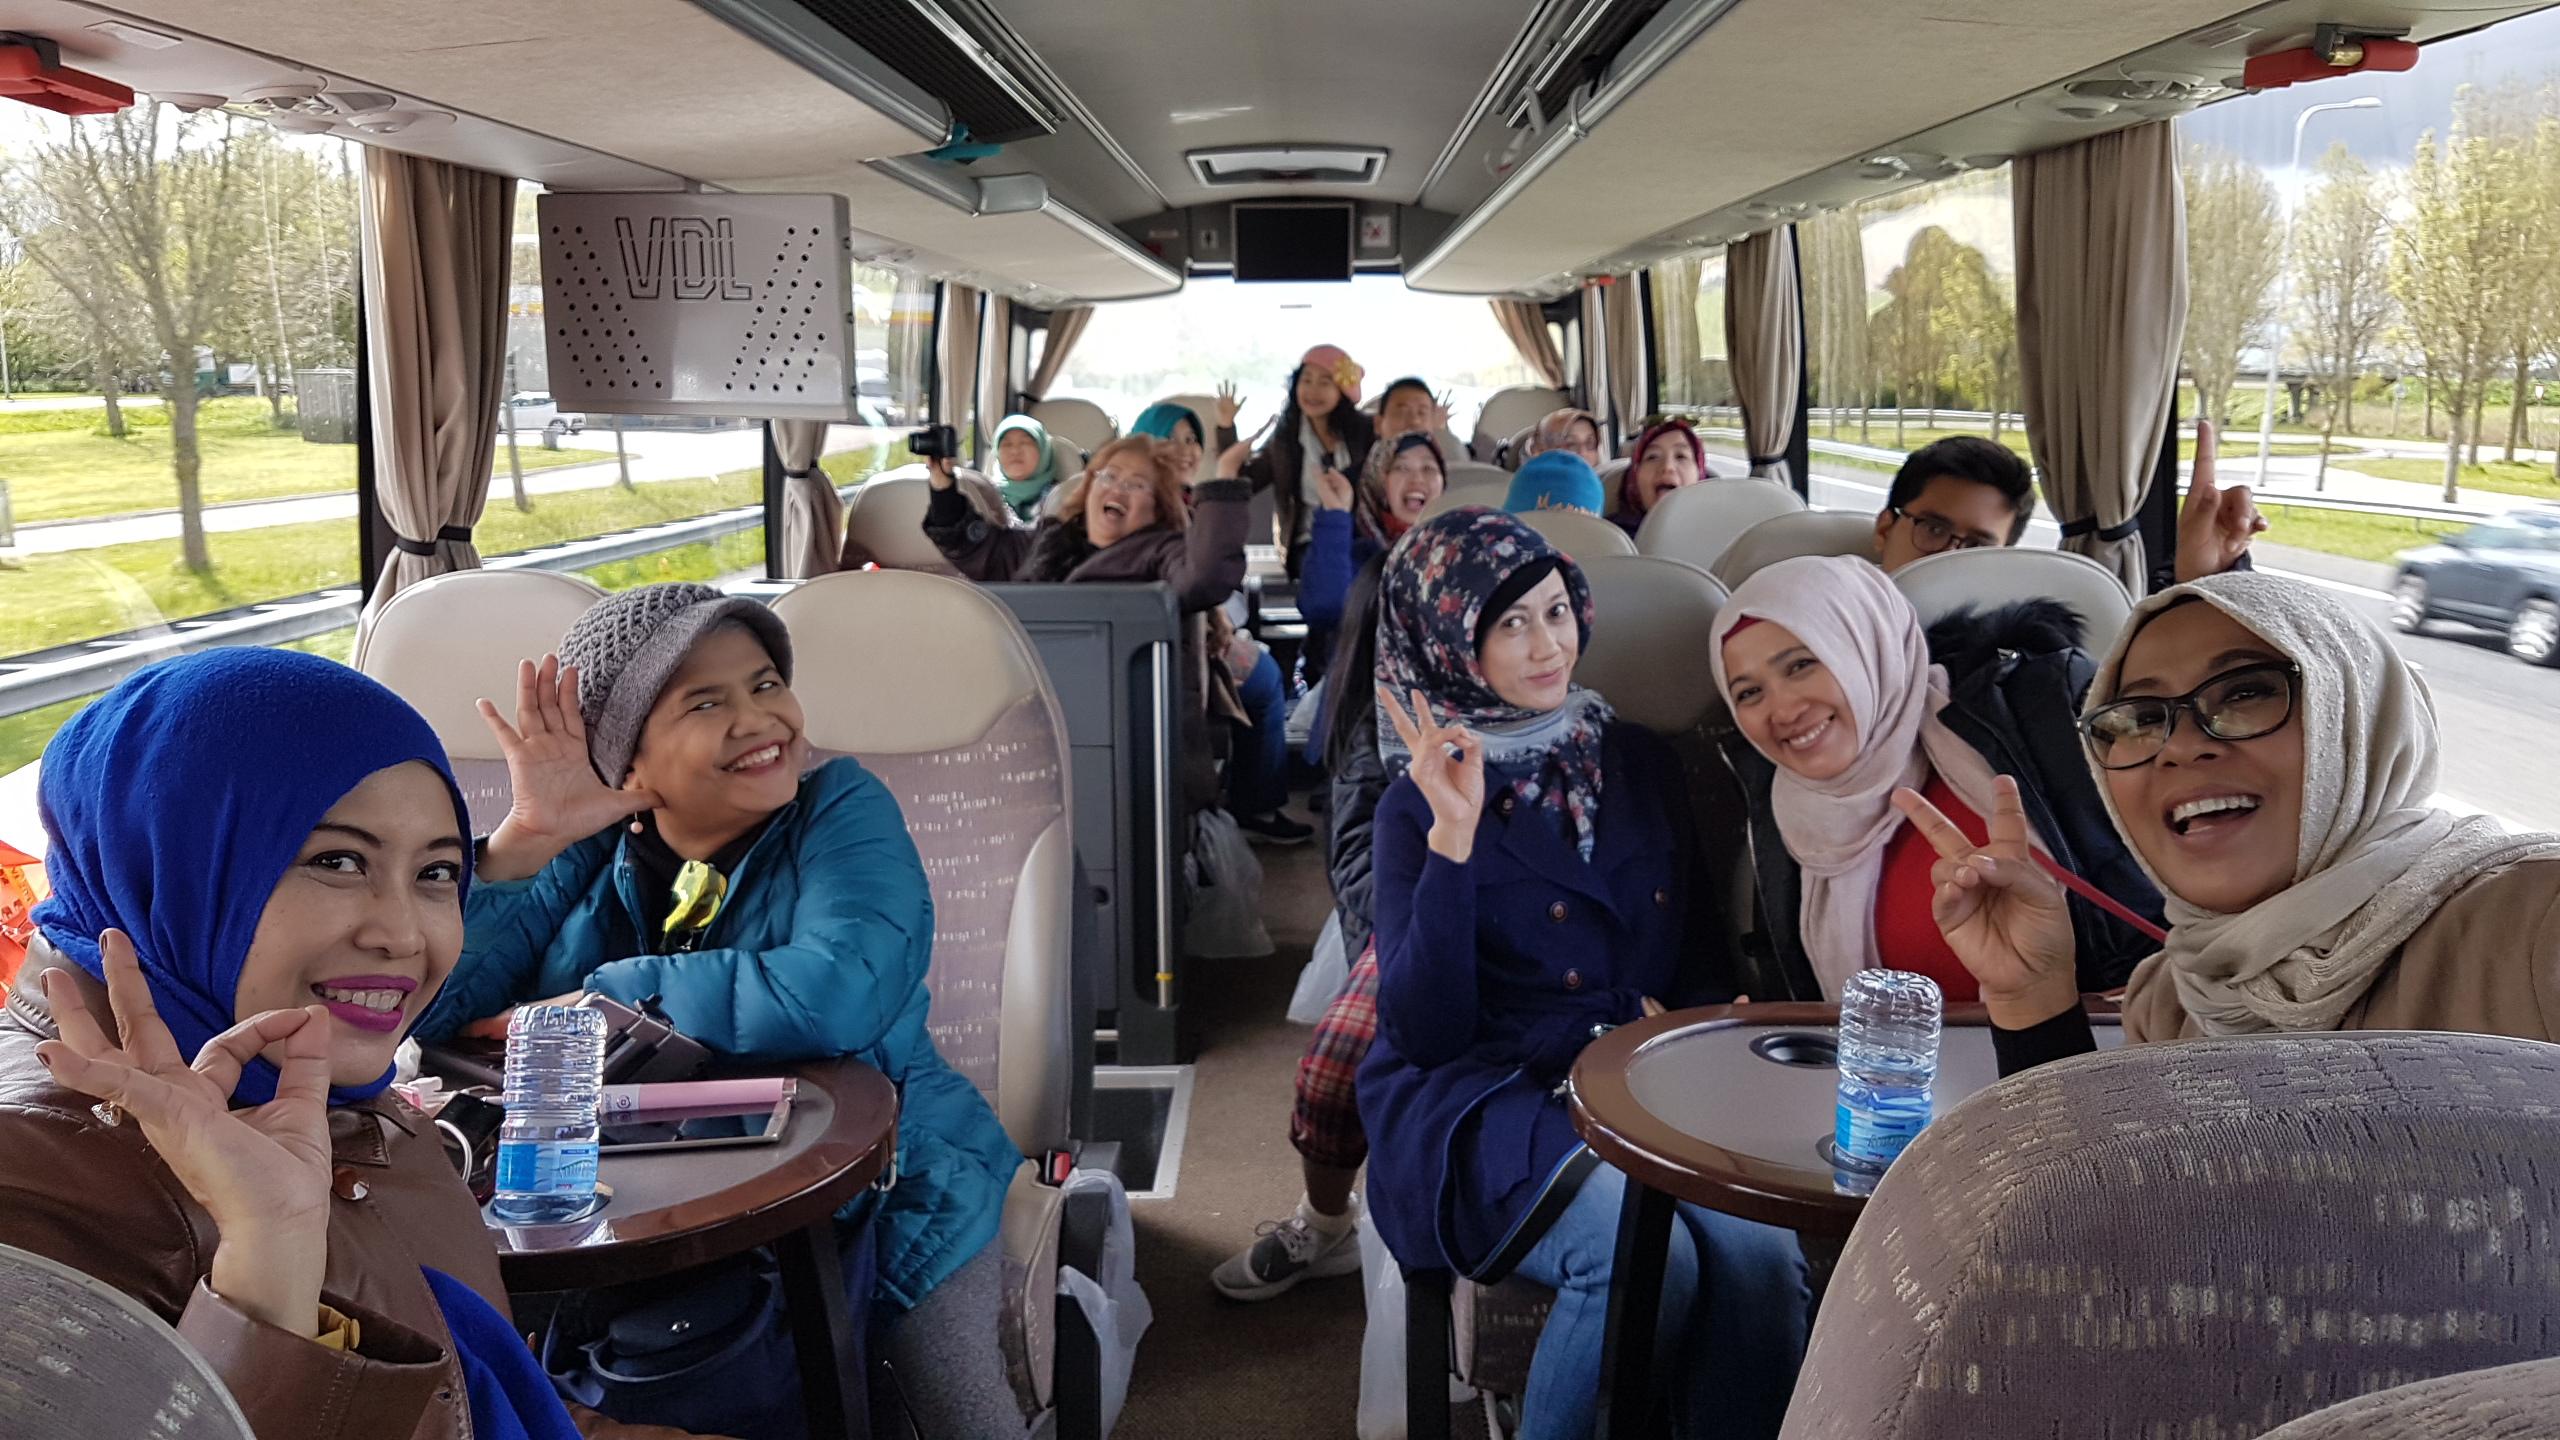 Transportasi Bus Wisata di Eropa, Rombongan besar wisata di Eropa, Menyewa Bus di Eropa. Wisata Rombonga besar.